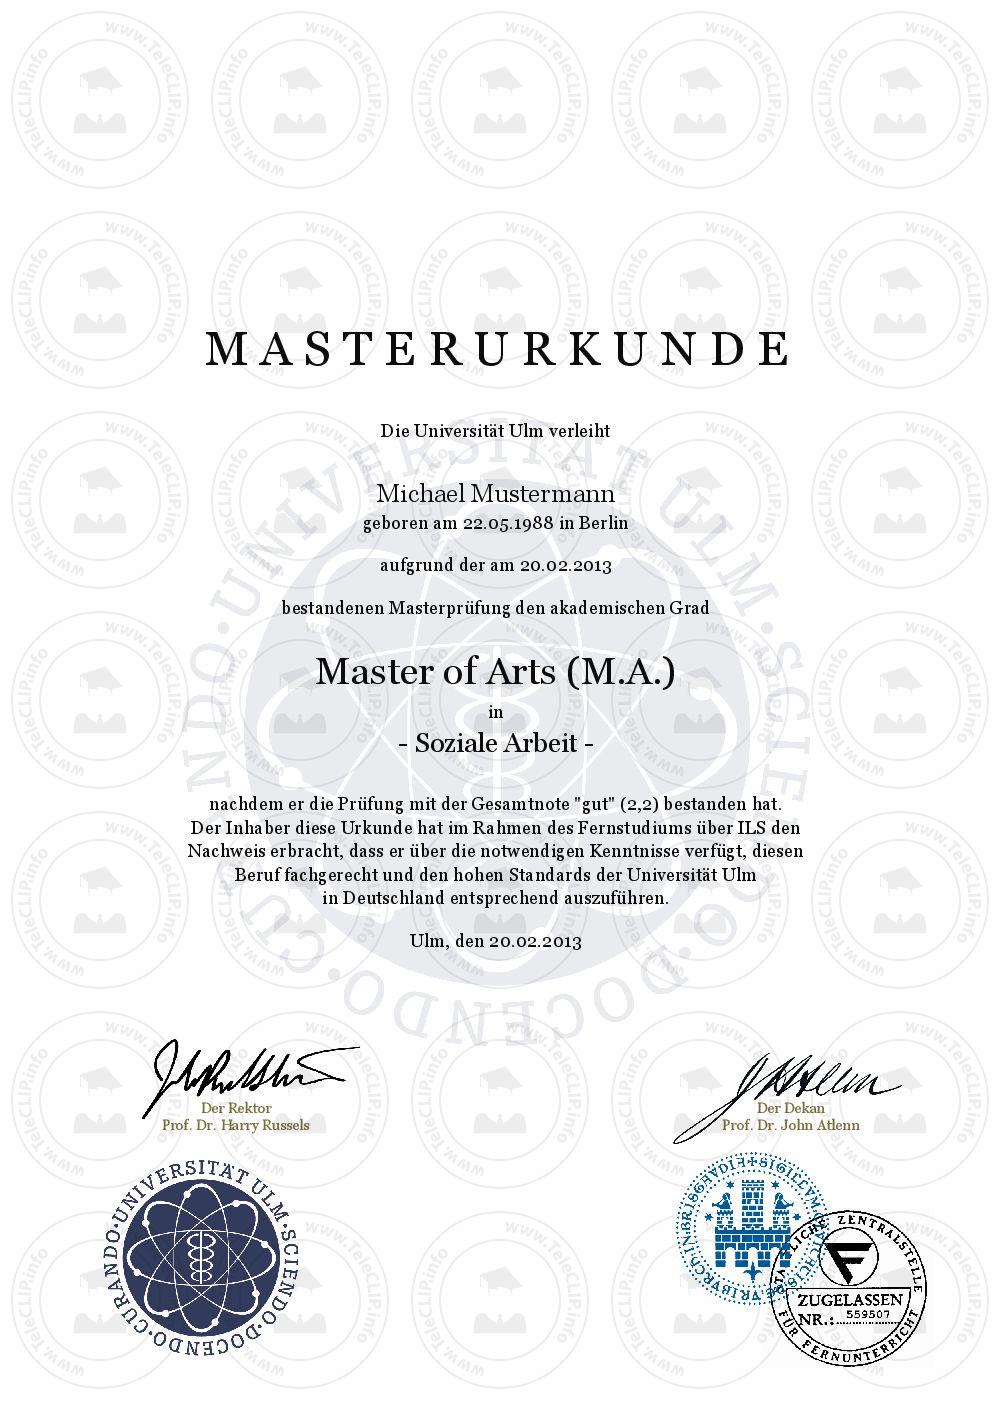 Master Bachelor Diplom Kaufen Universitat Ulm Ulm University Master Urkunde Universitat Ulm Einfach Online Kaufen F Bachelor Master Bachelor Abschluss